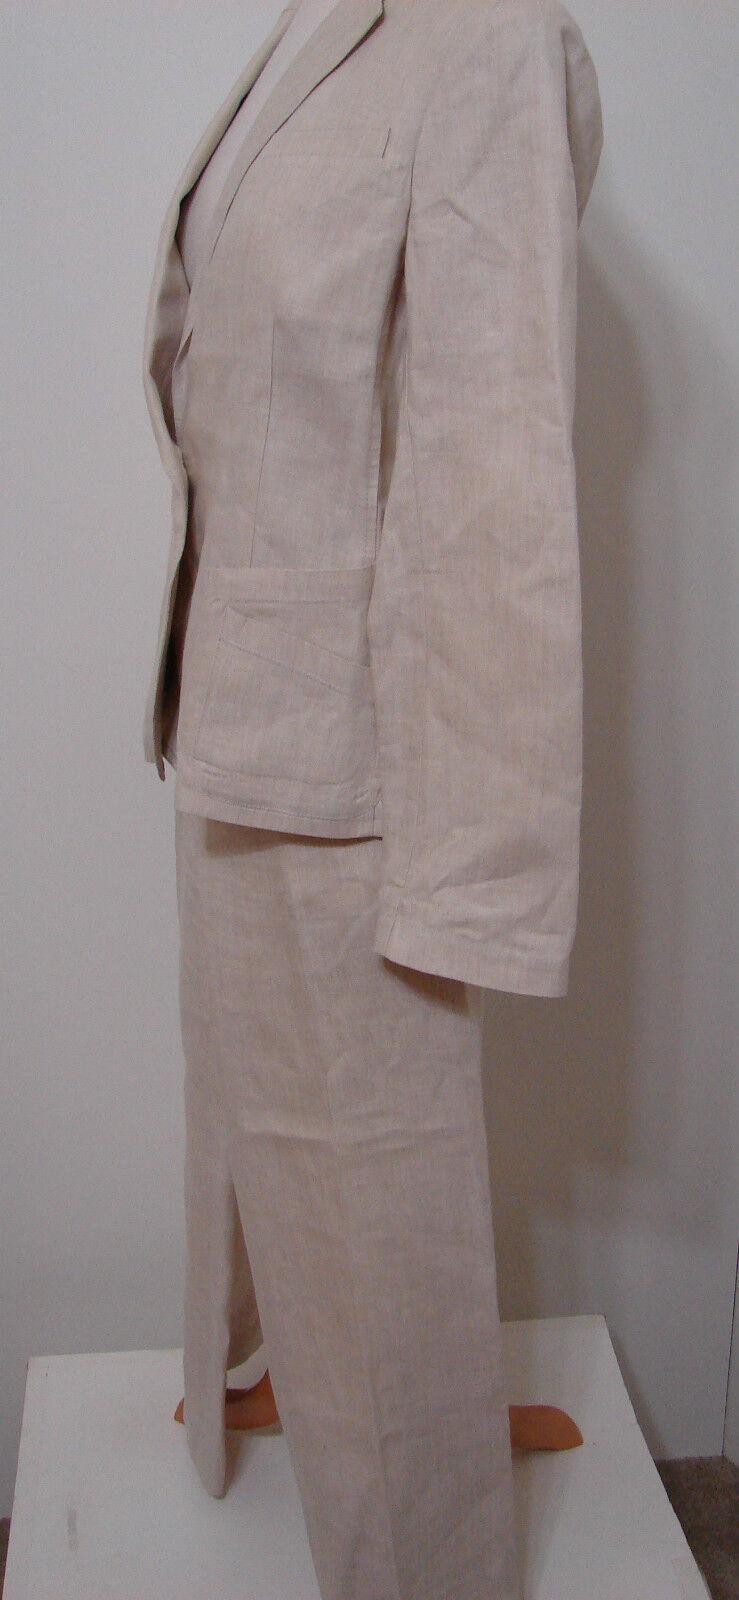 Donna Karan DKNY Pant Suit & Jacket Cream 100% Li… - image 5